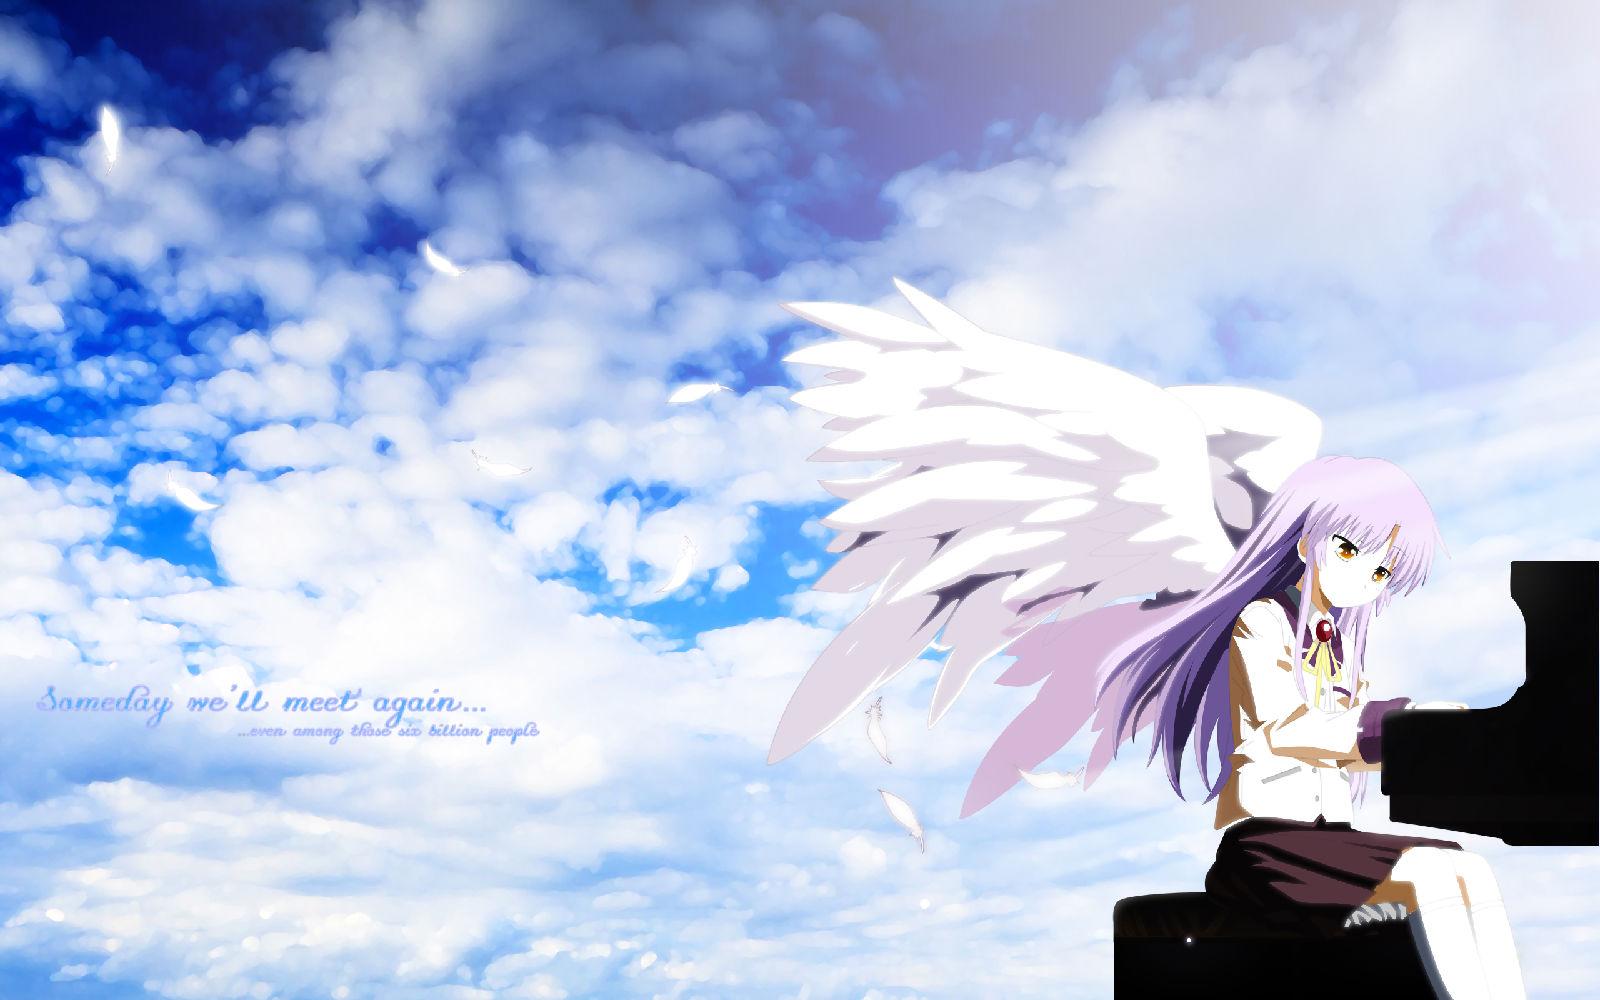 Kanade-Tachibana-3-angel-beats-35445381-1600-1000.jpg